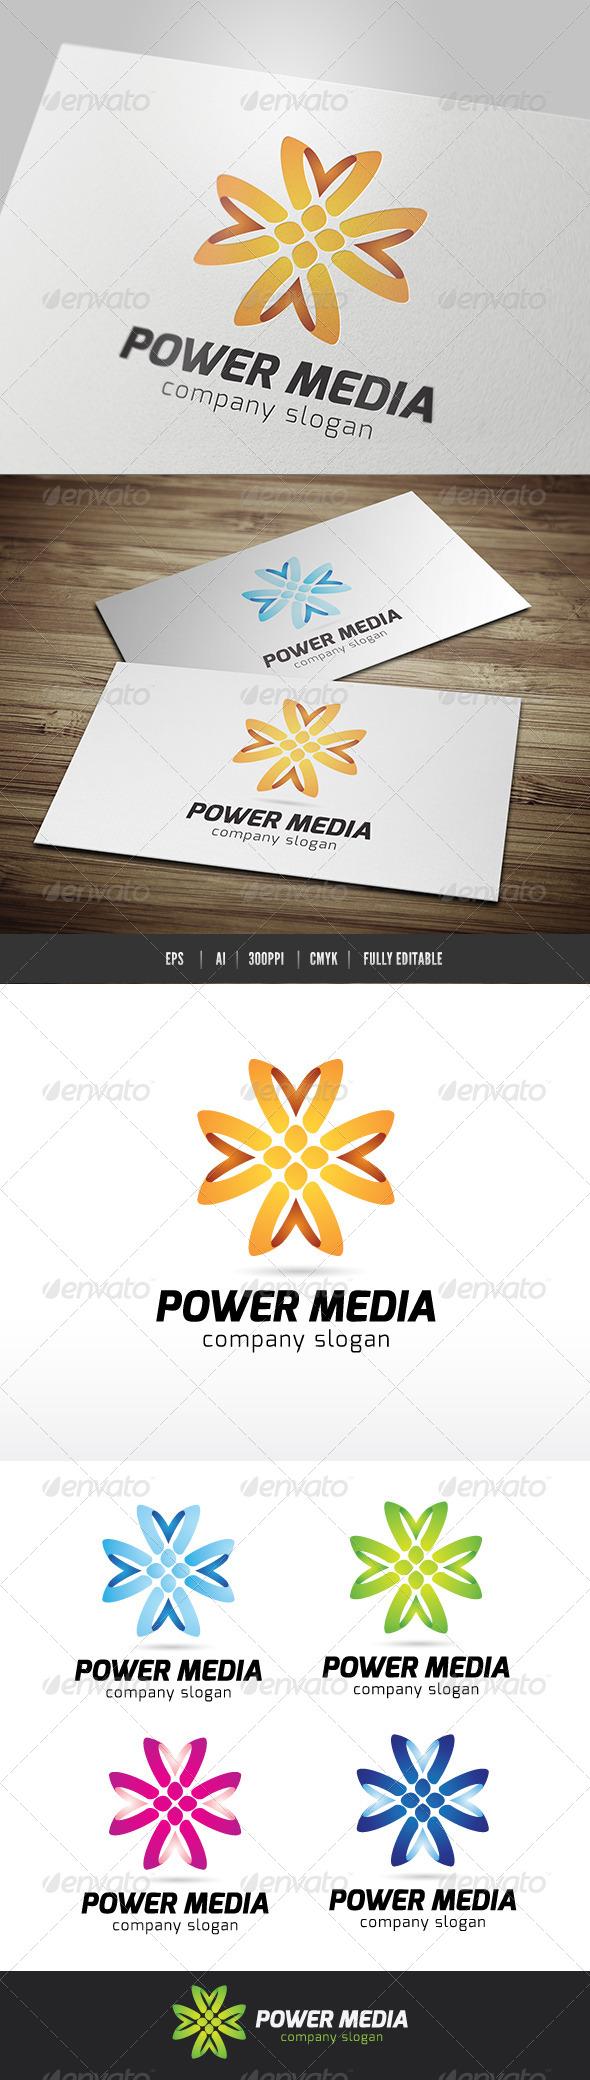 GraphicRiver Power Media 6618329